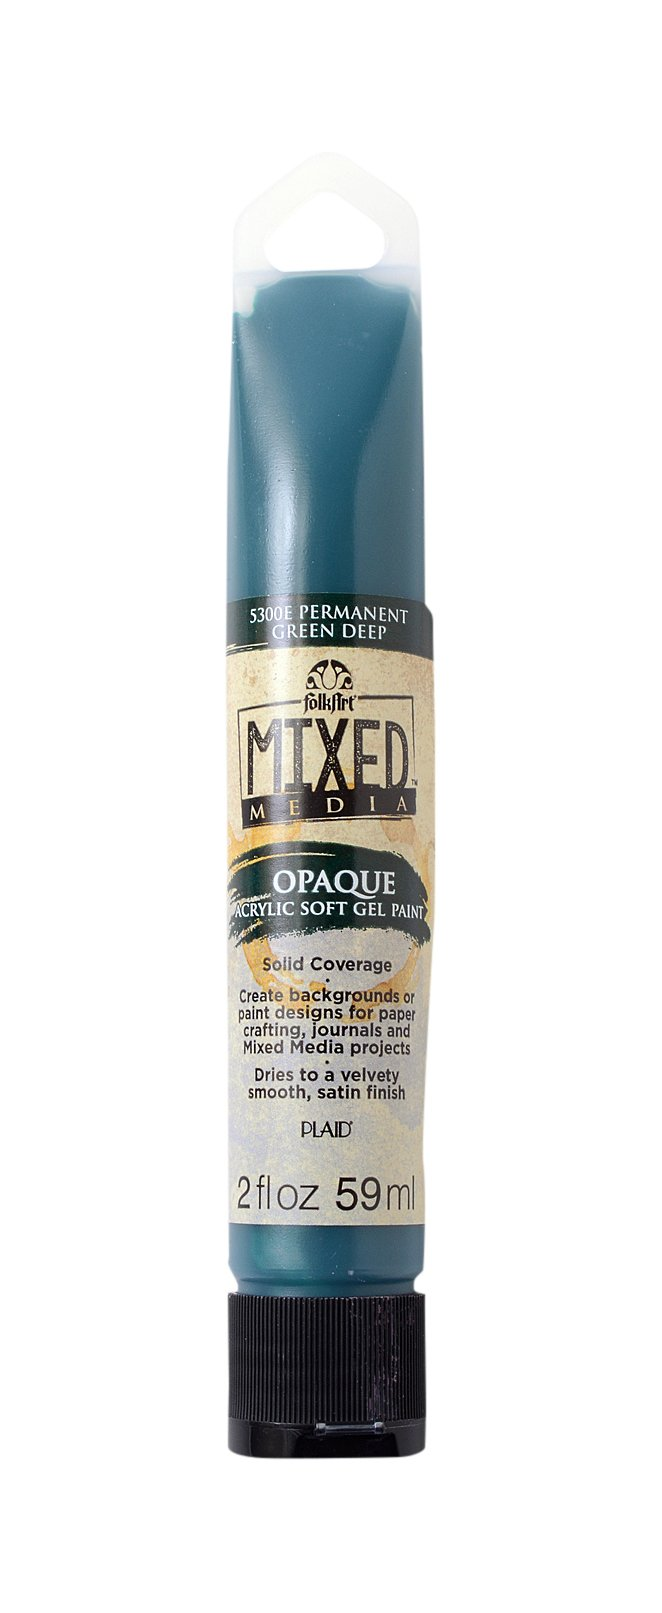 FolkArt Mixed Media Color Spray Acrylic Paint in Assorted Colors (2 Ounce), 5330E Black